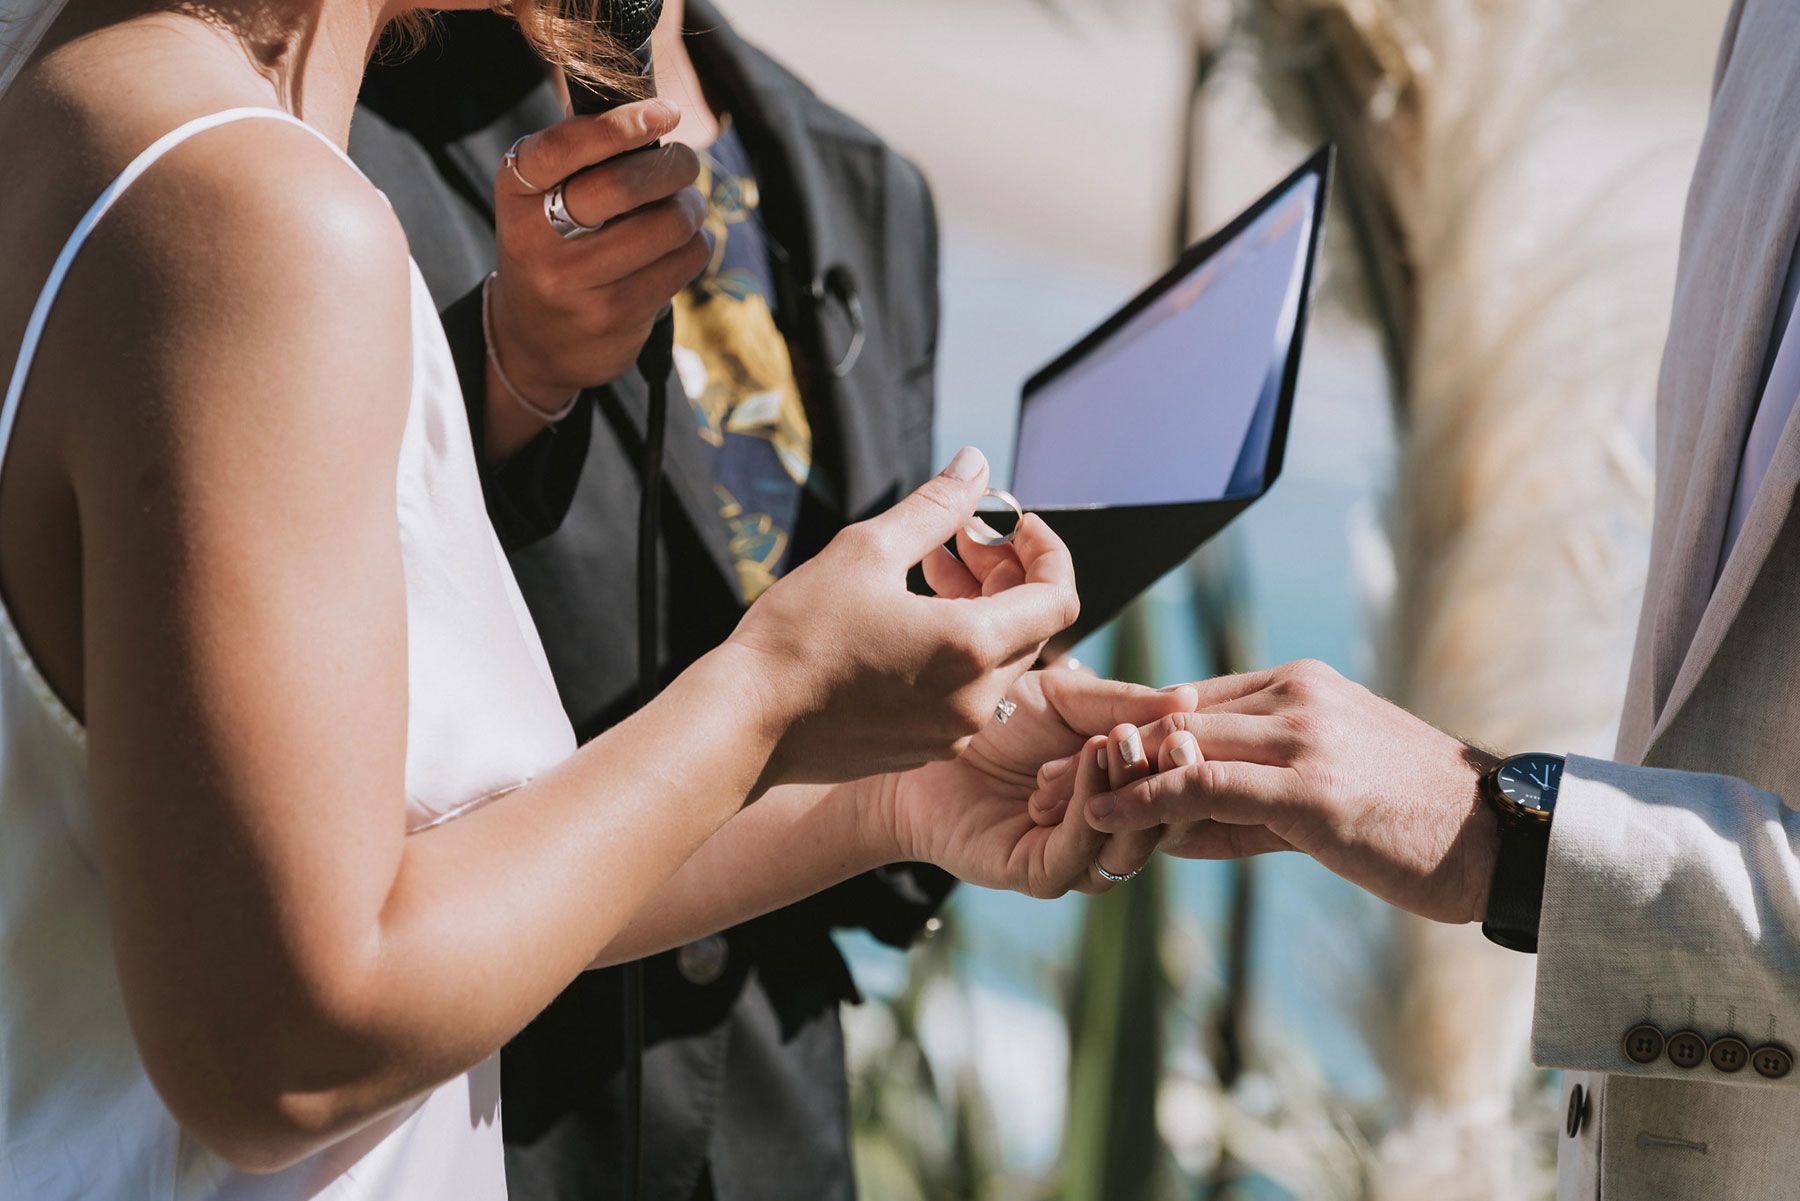 newfound-j-n-orua-beach-house-coromandel-wedding-photographers-458